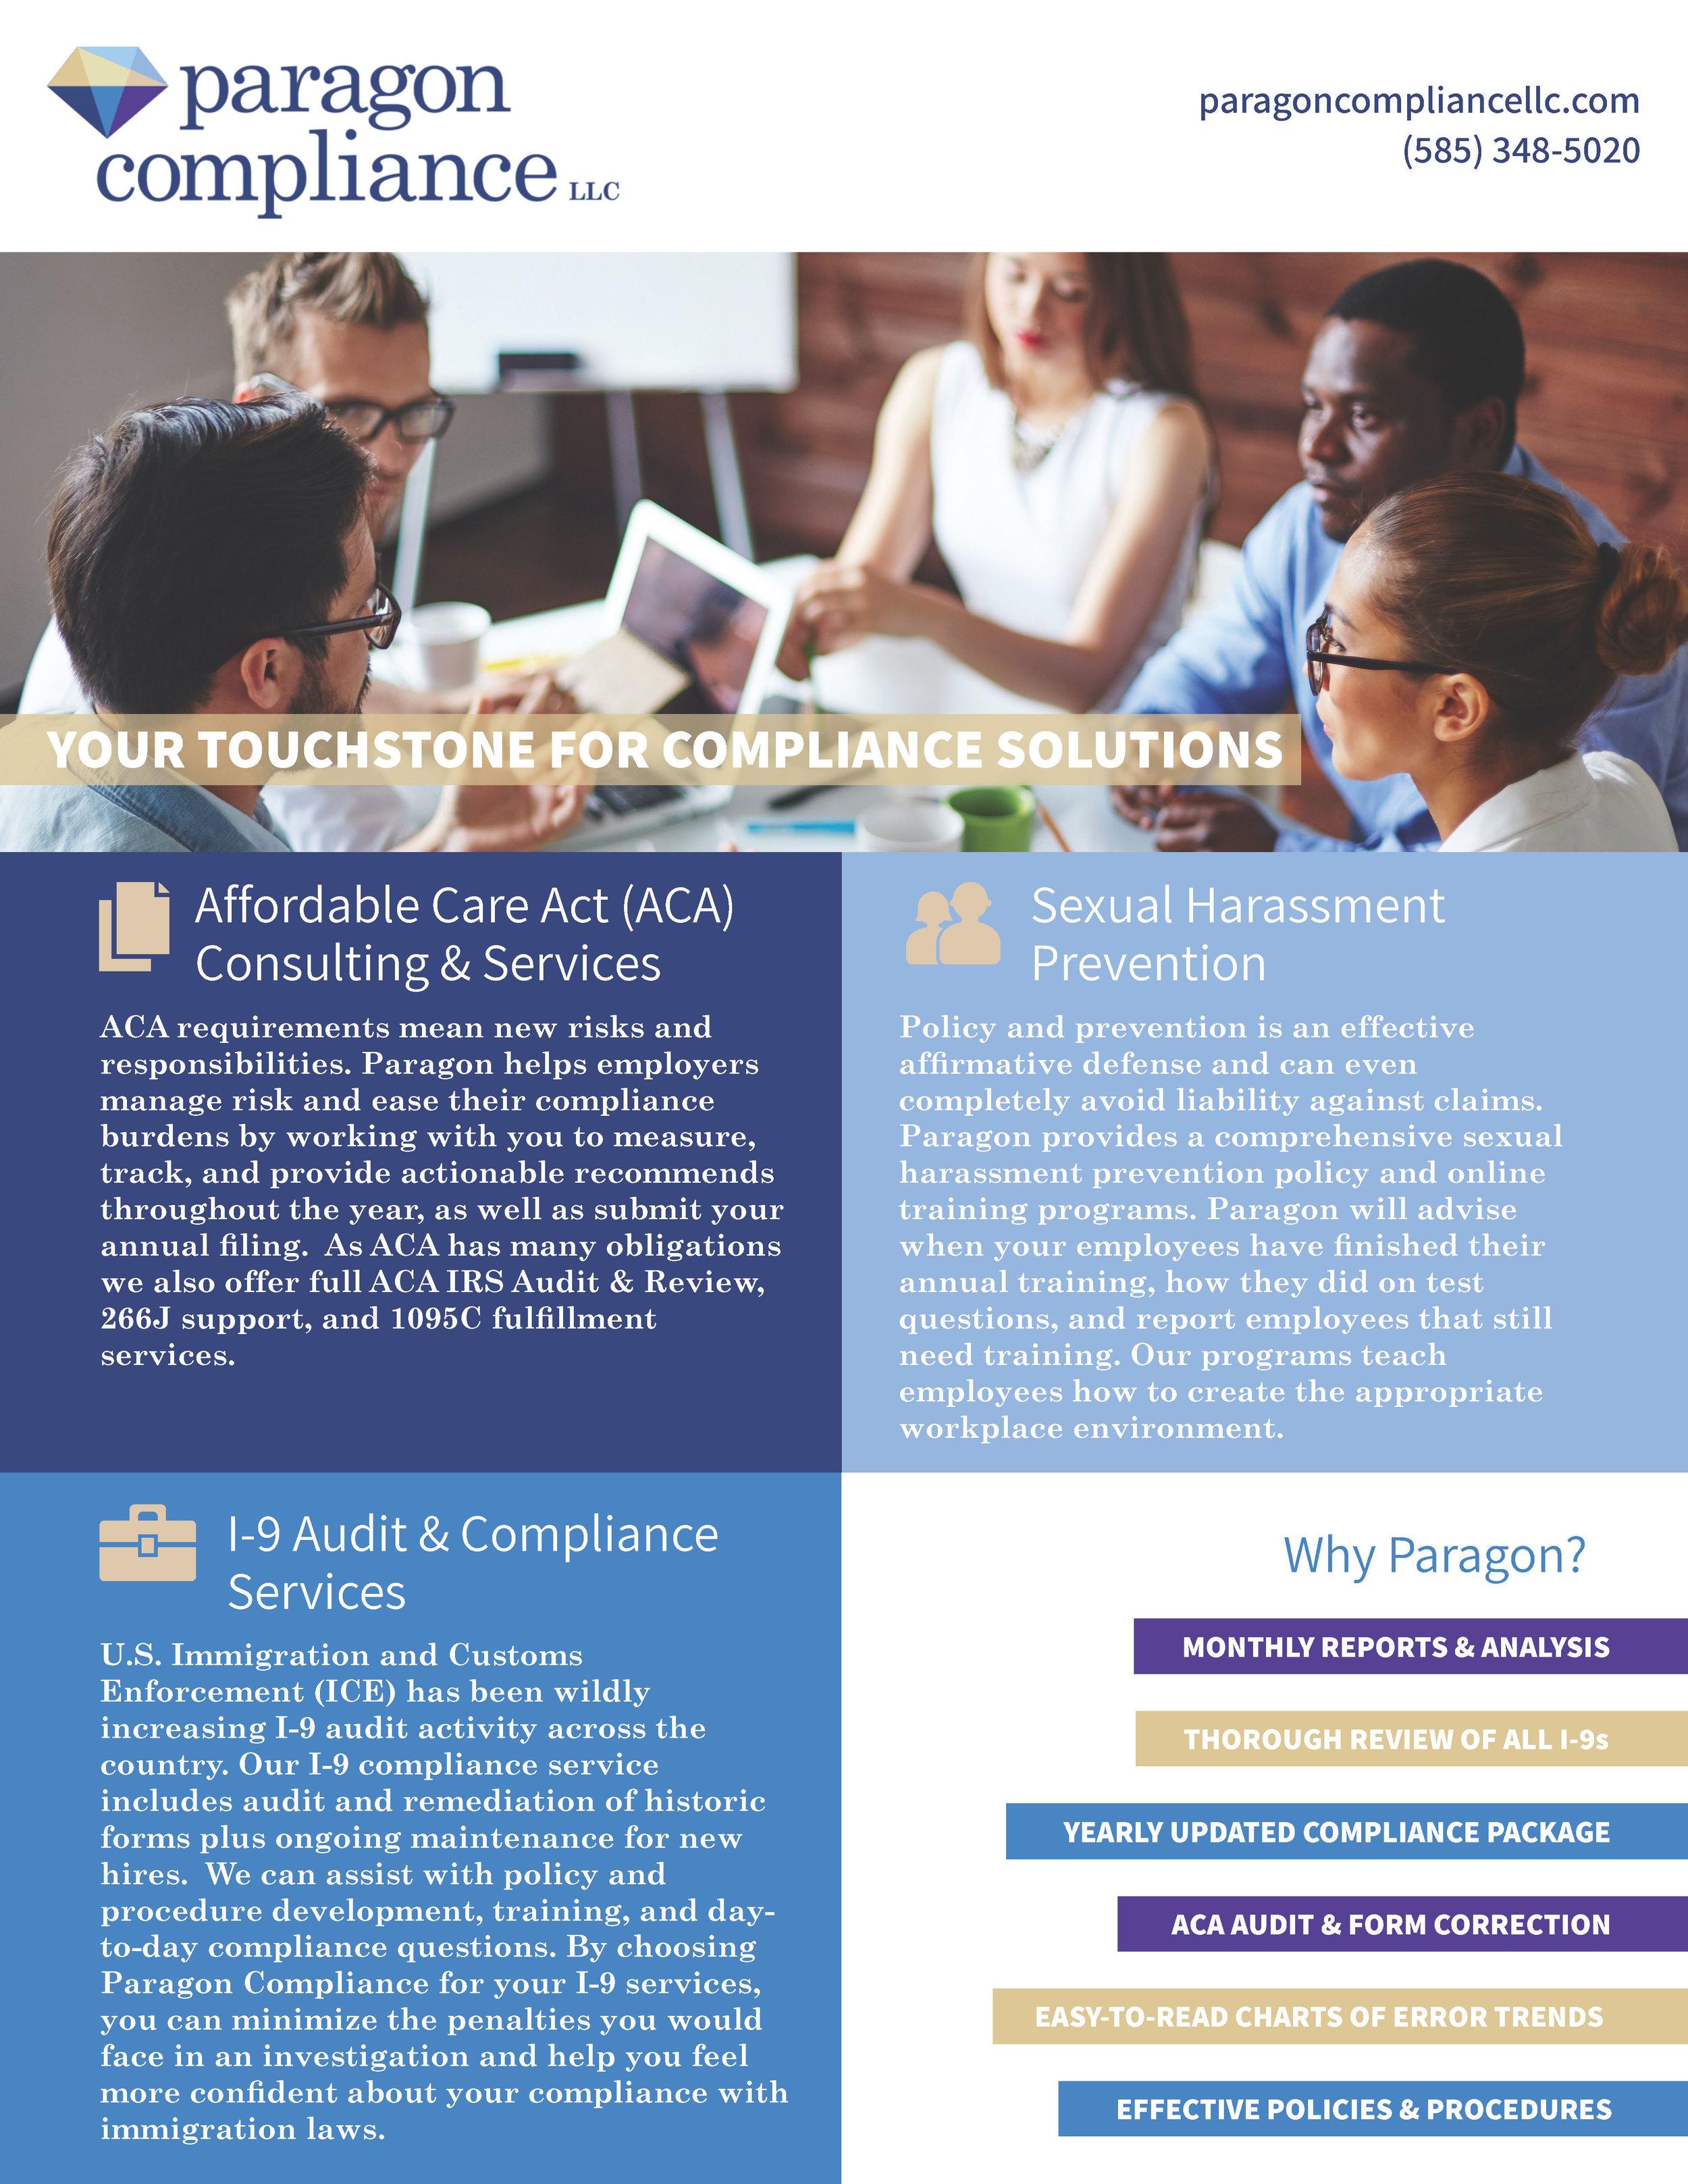 Paragon Compliance LLC: Company Flyers -